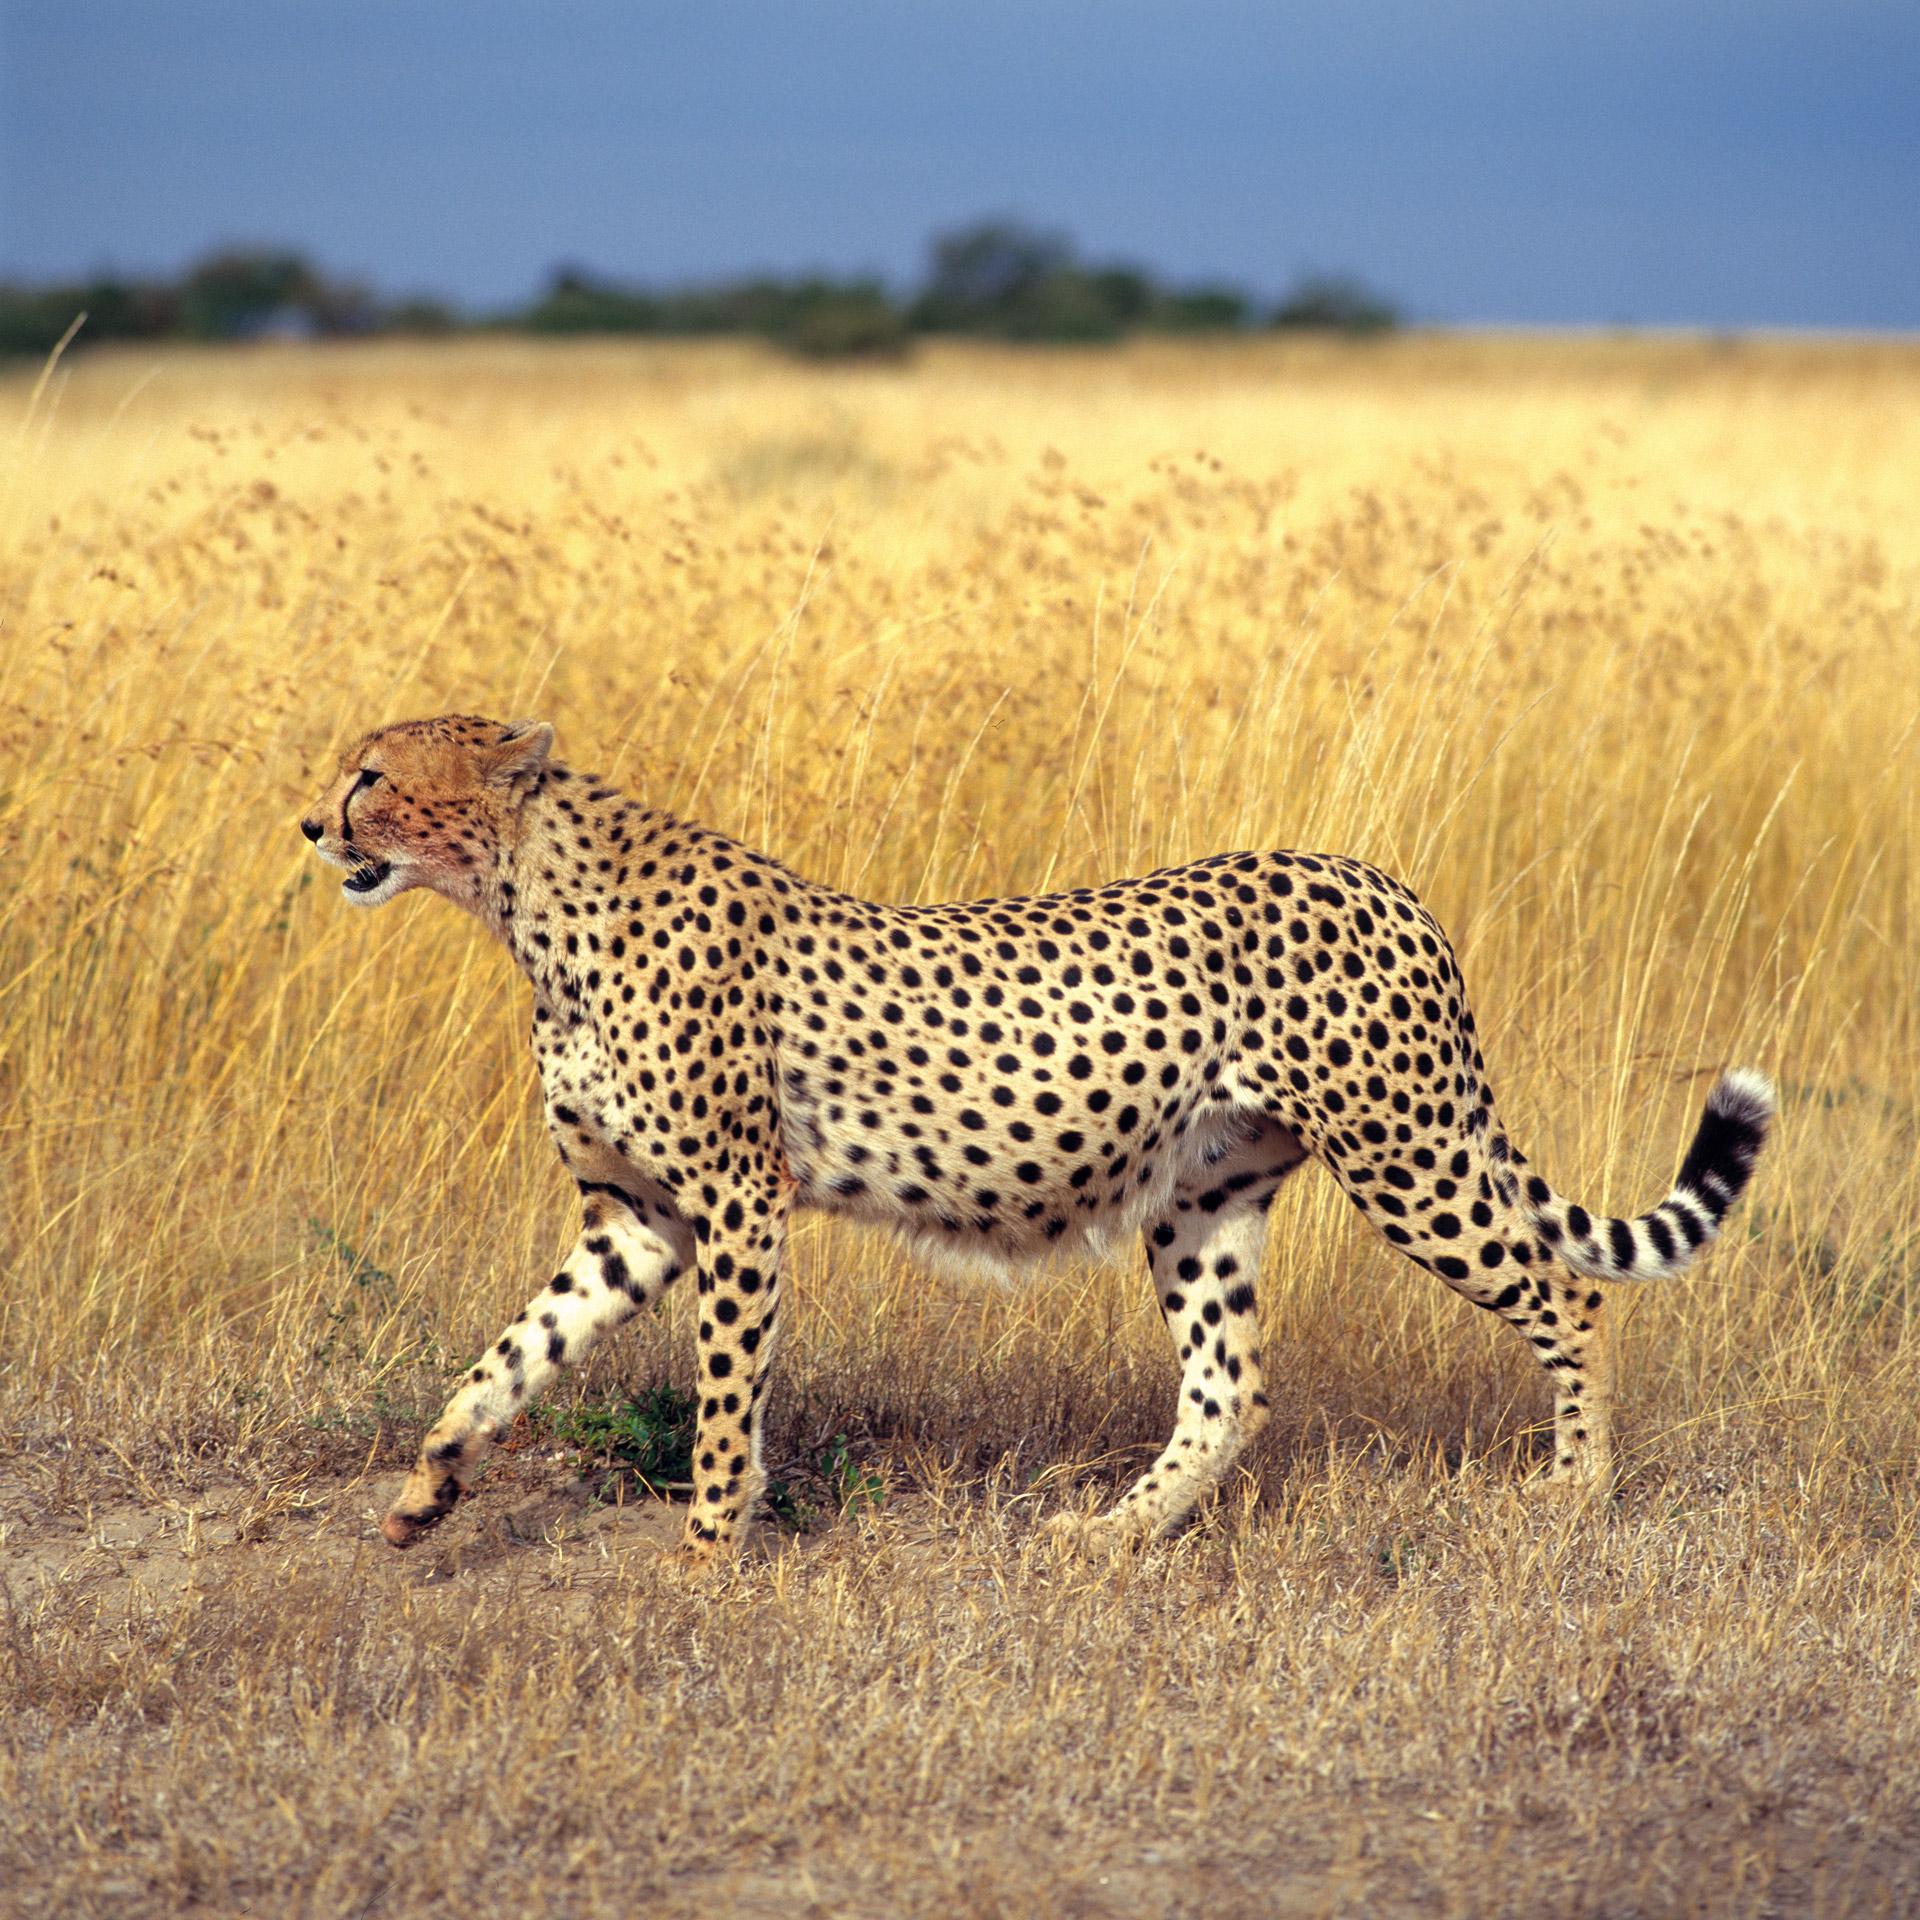 A cheetah in Masai Mara Kenya